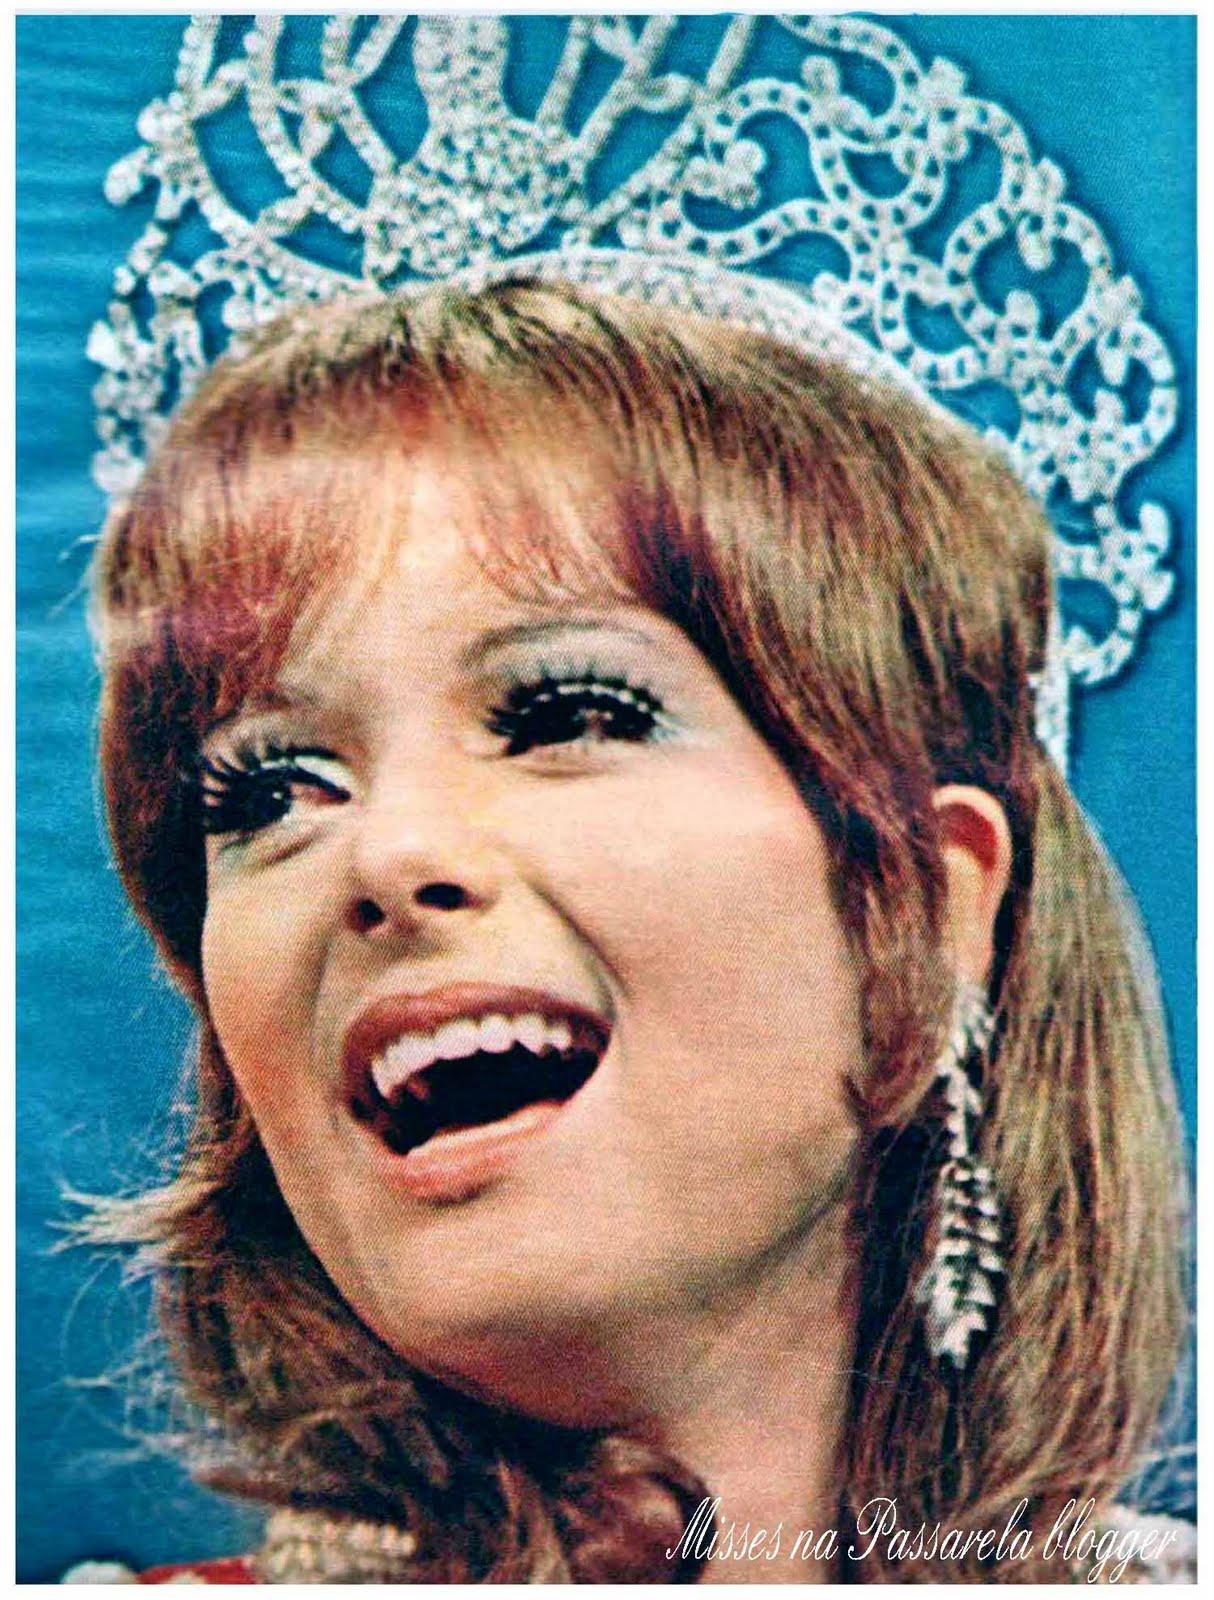 marisol malaret, miss universe 1970. 70pc3a12